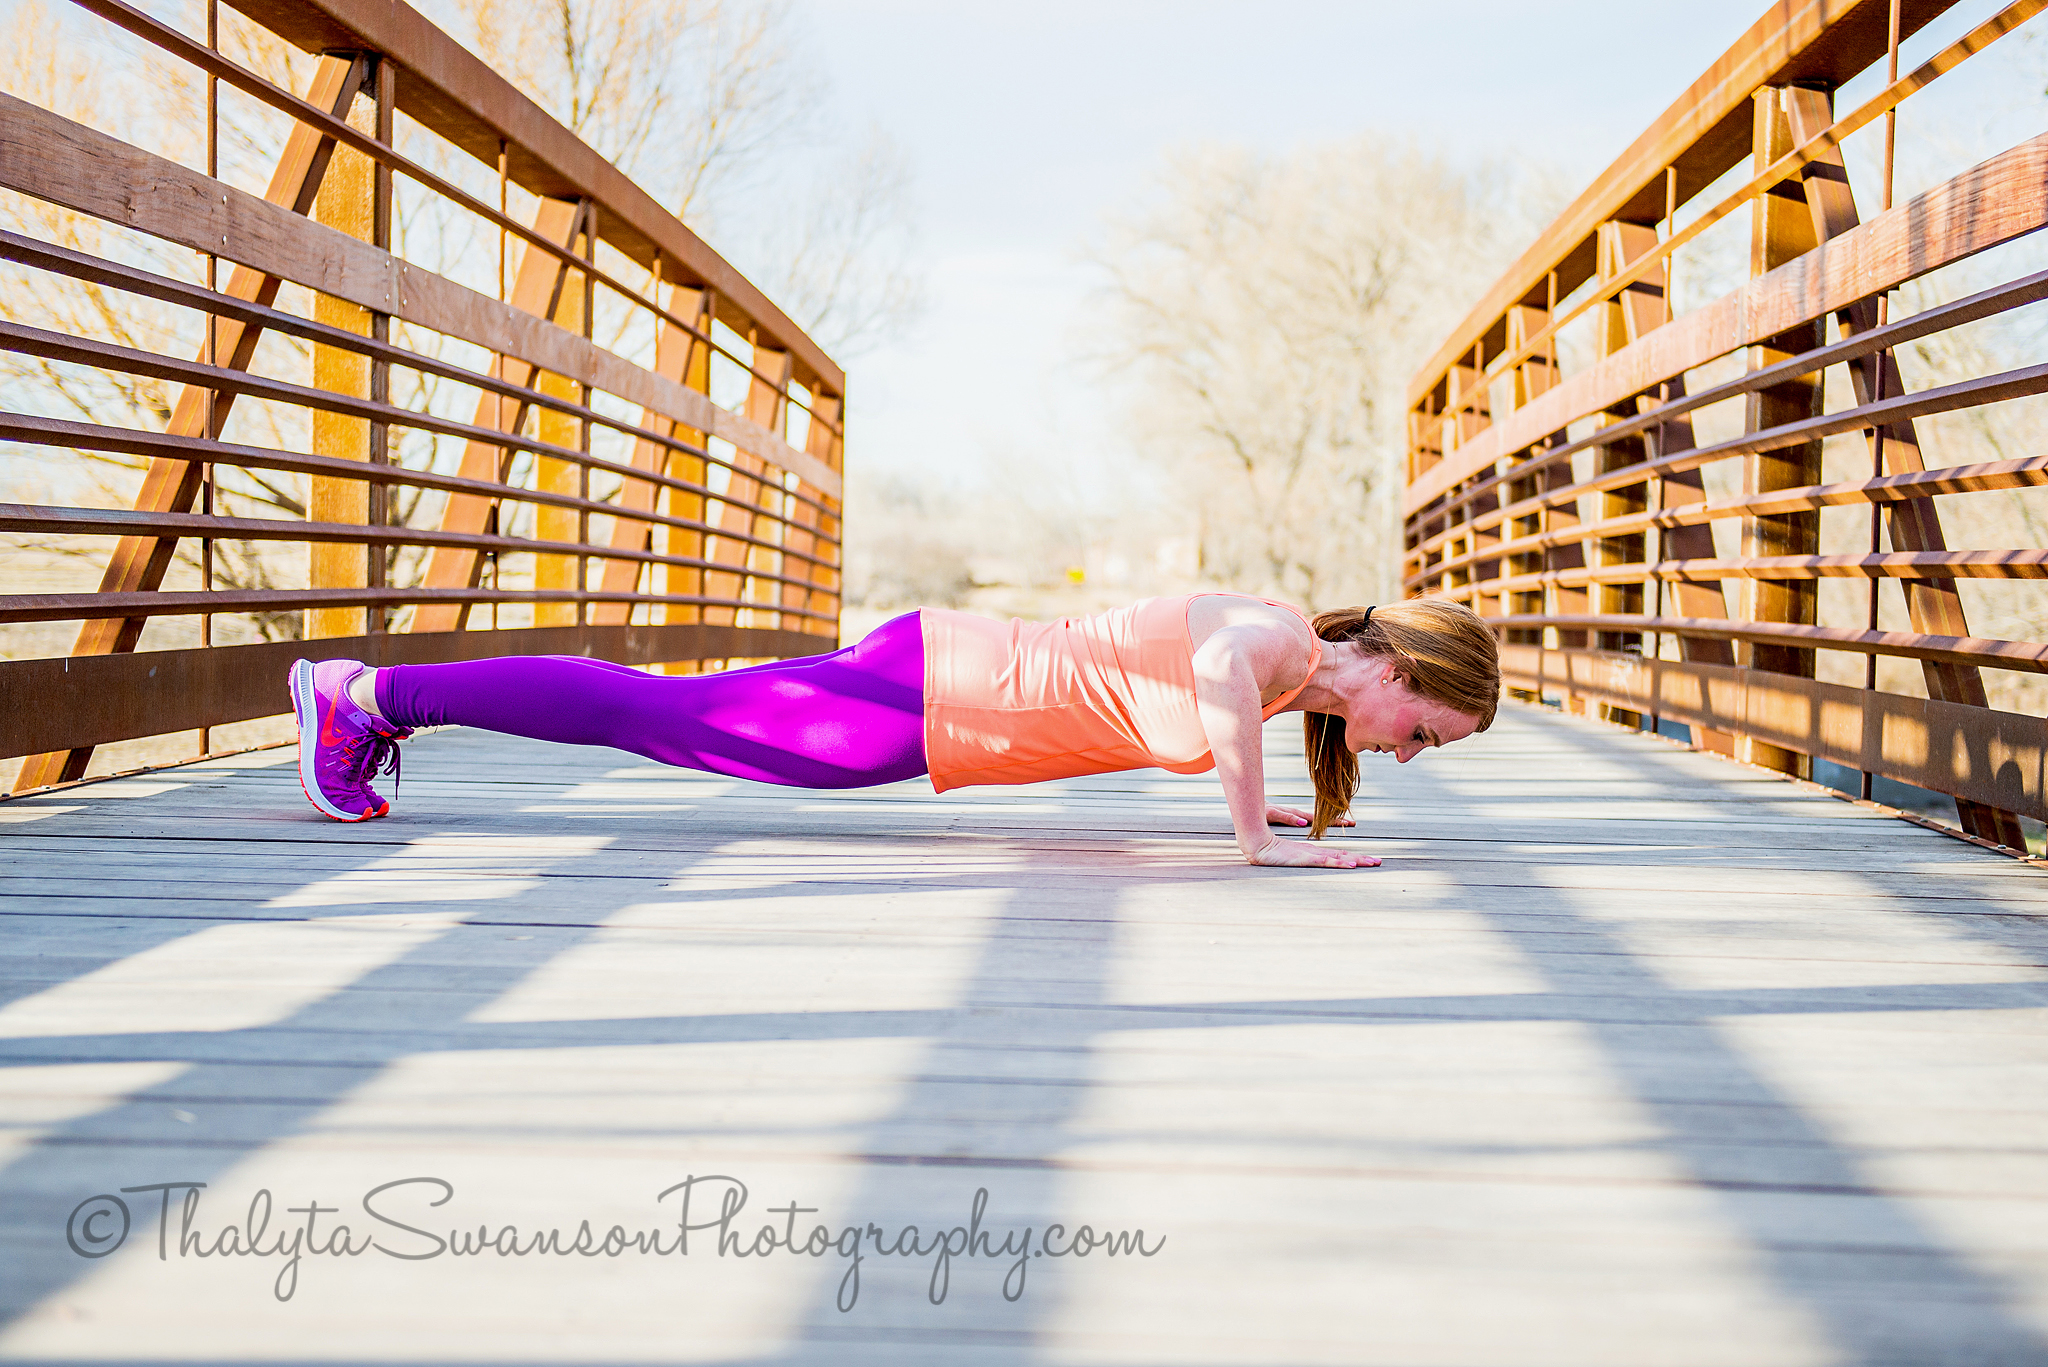 Thalyta Swanson Photography - Fitness Photos (9)